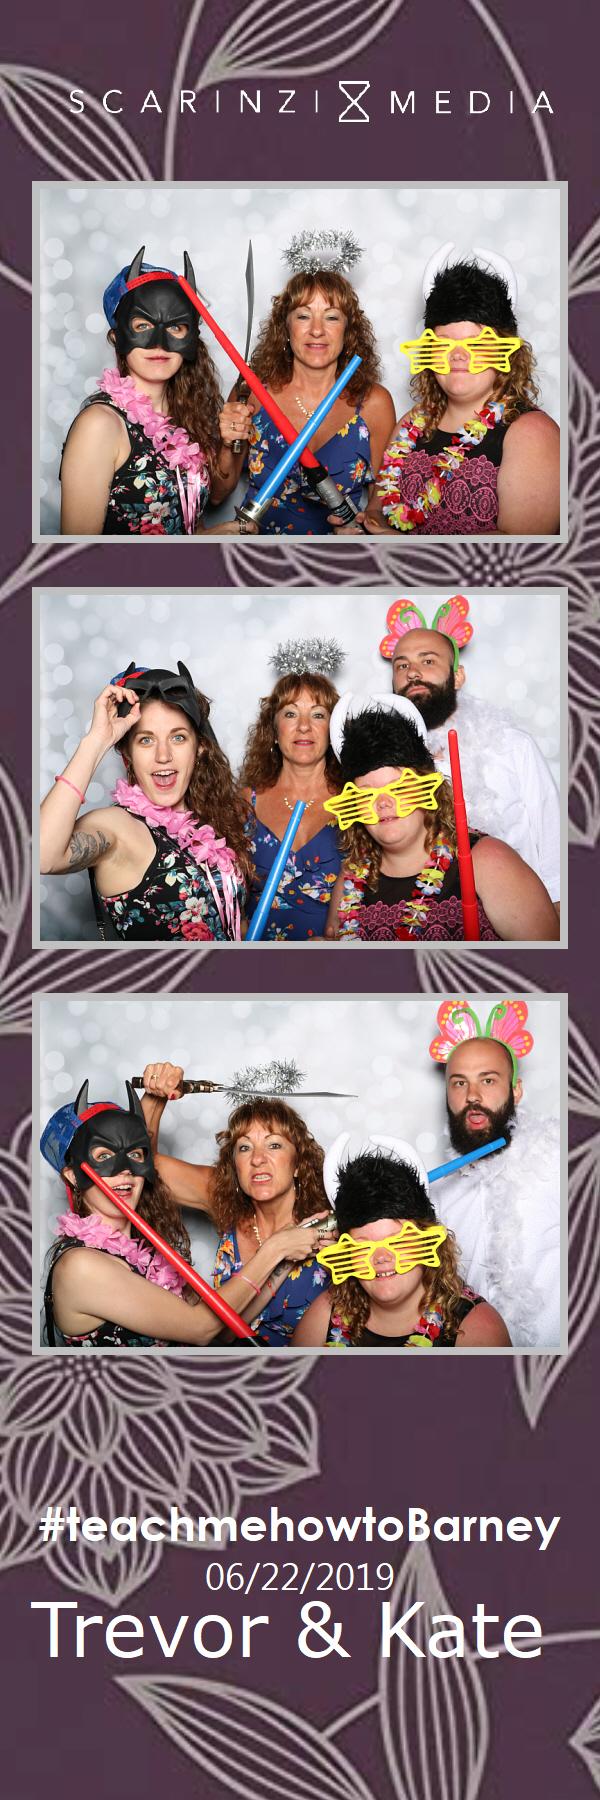 2019.06.22 - Barney Wedding PHOTOBOOTH71.jpg